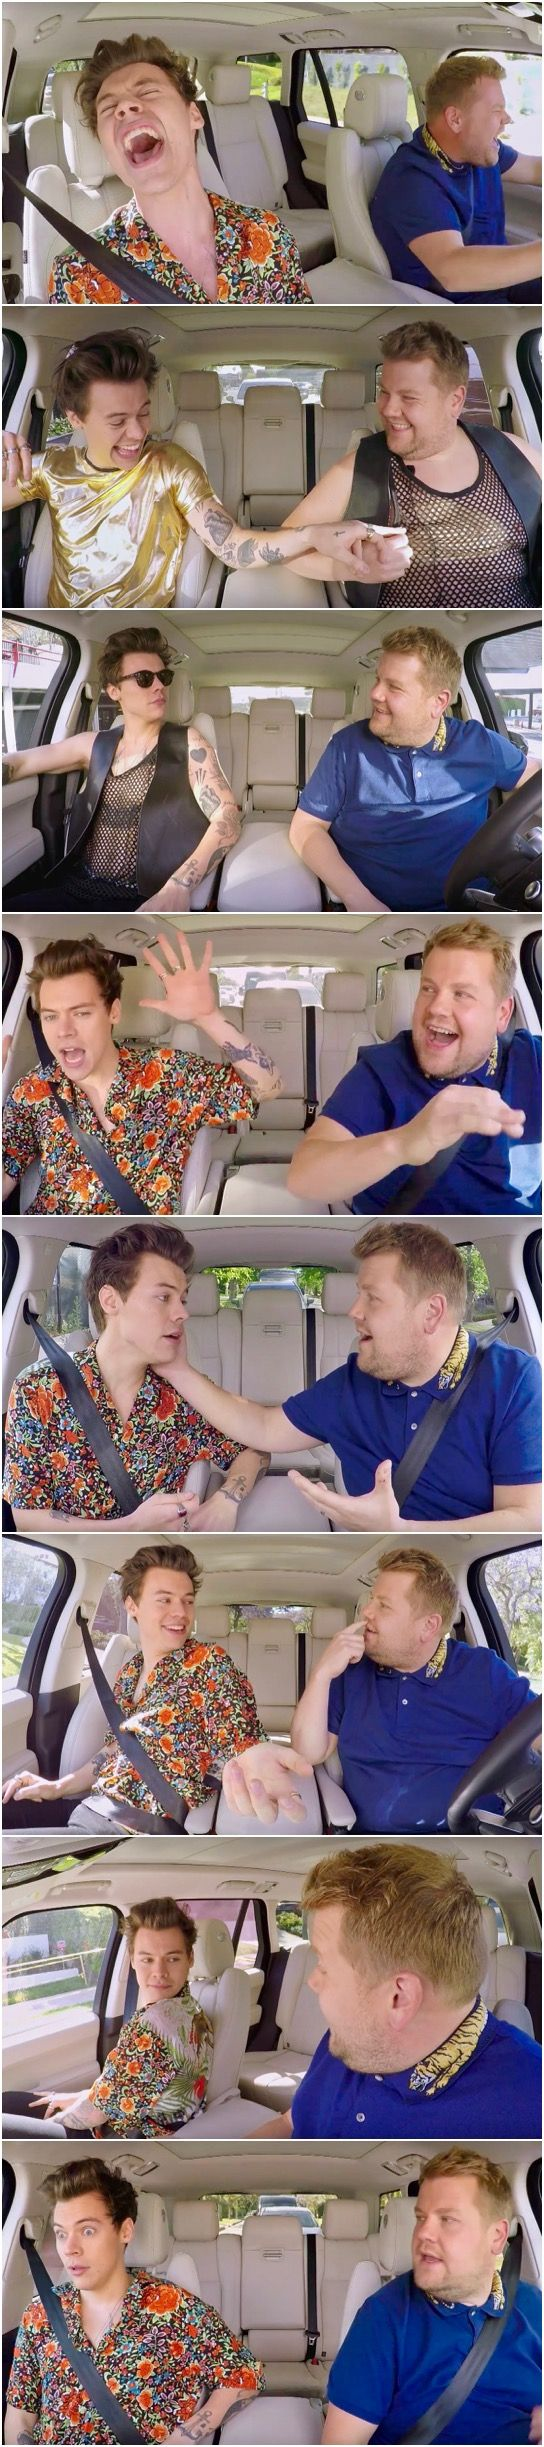 NEW | Pure Joy! Harry's Carpool Karaoke on The Late Late Show with James Corden. Watch it here! Follow rickysturn/harry-styles